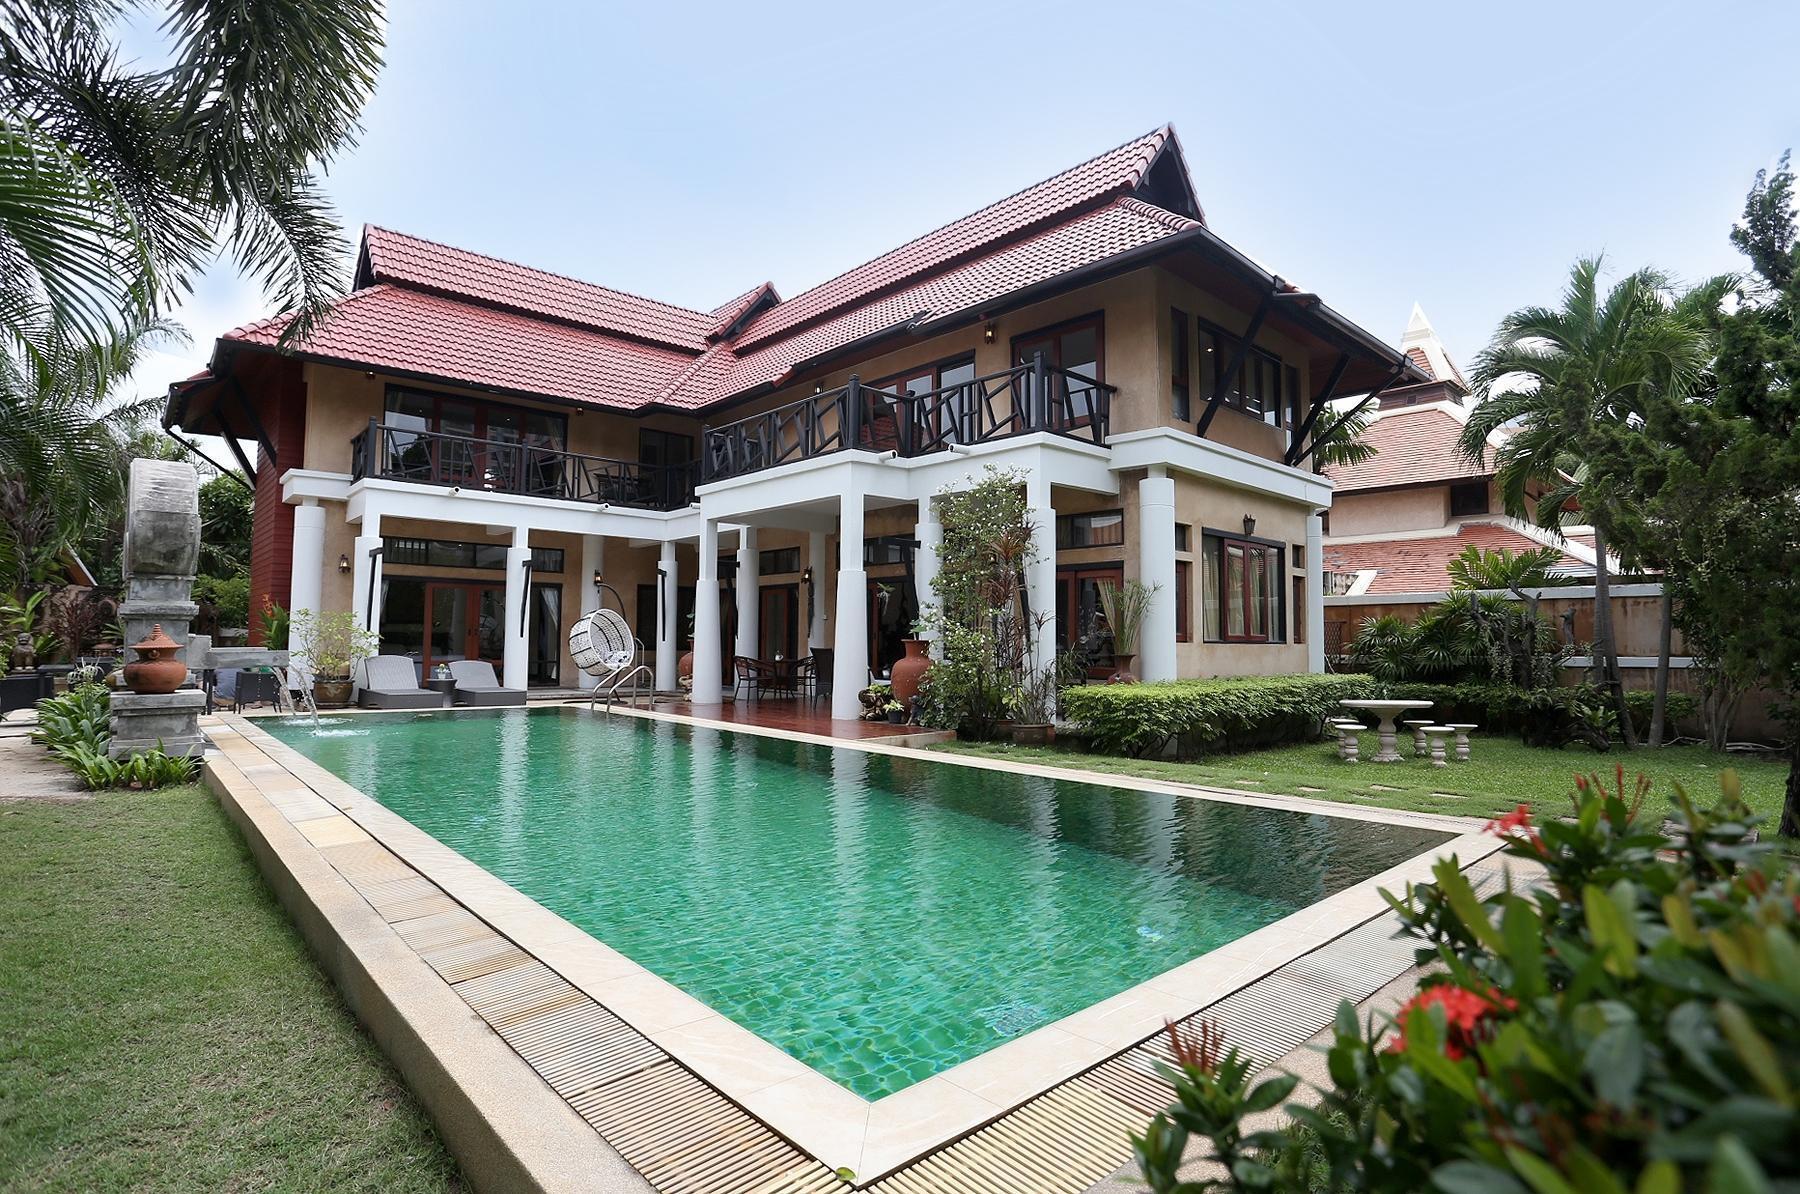 rakpattaya pool villa thai bali style 3 bed room บ้านเดี่ยว 3 ห้องนอน 3 ห้องน้ำส่วนตัว ขนาด 1600 ตร.ม. – เขาพระตำหนัก